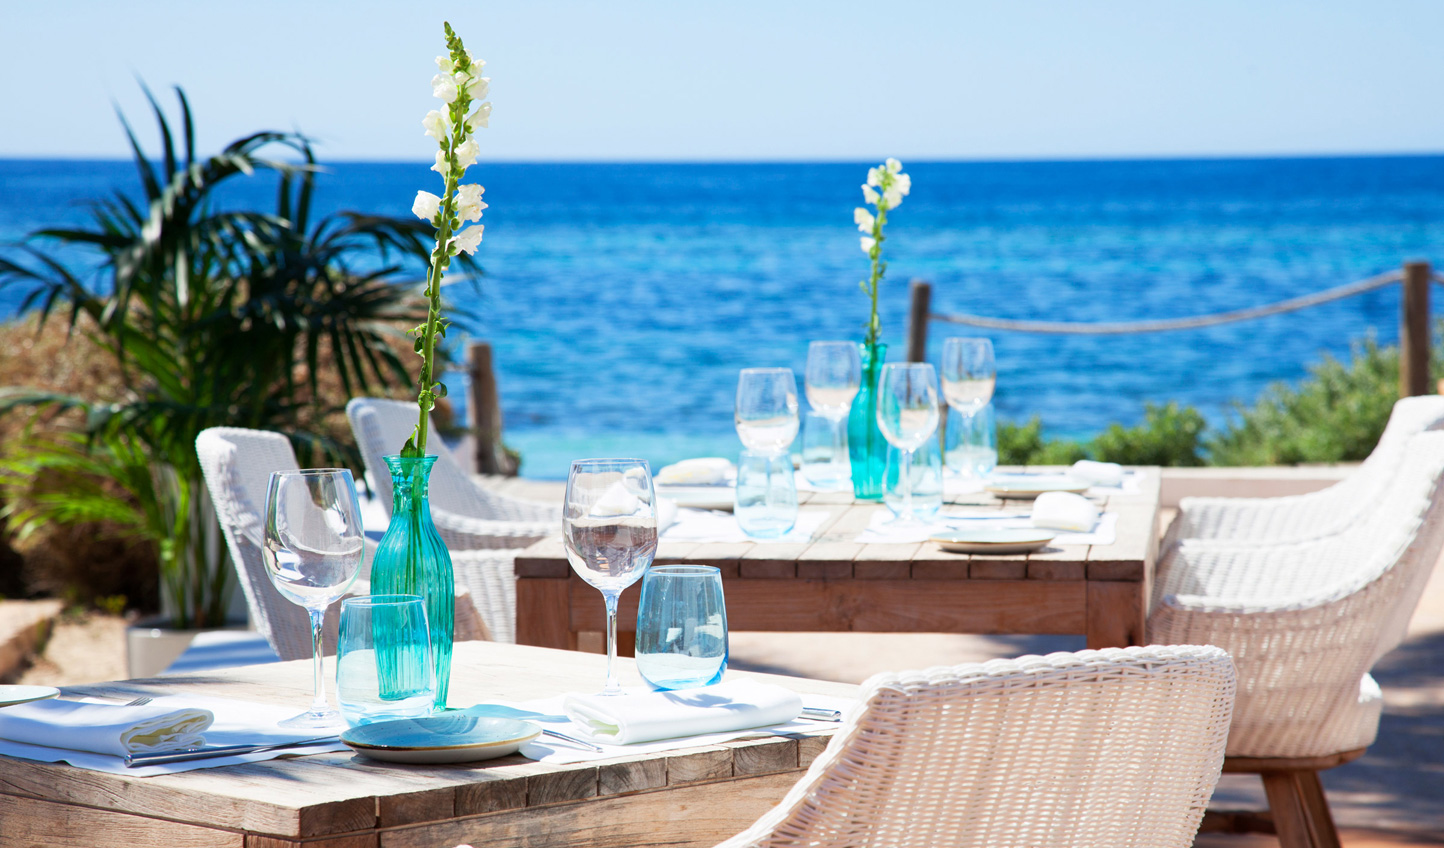 Dine alfresco beneath the Balearic sunshine